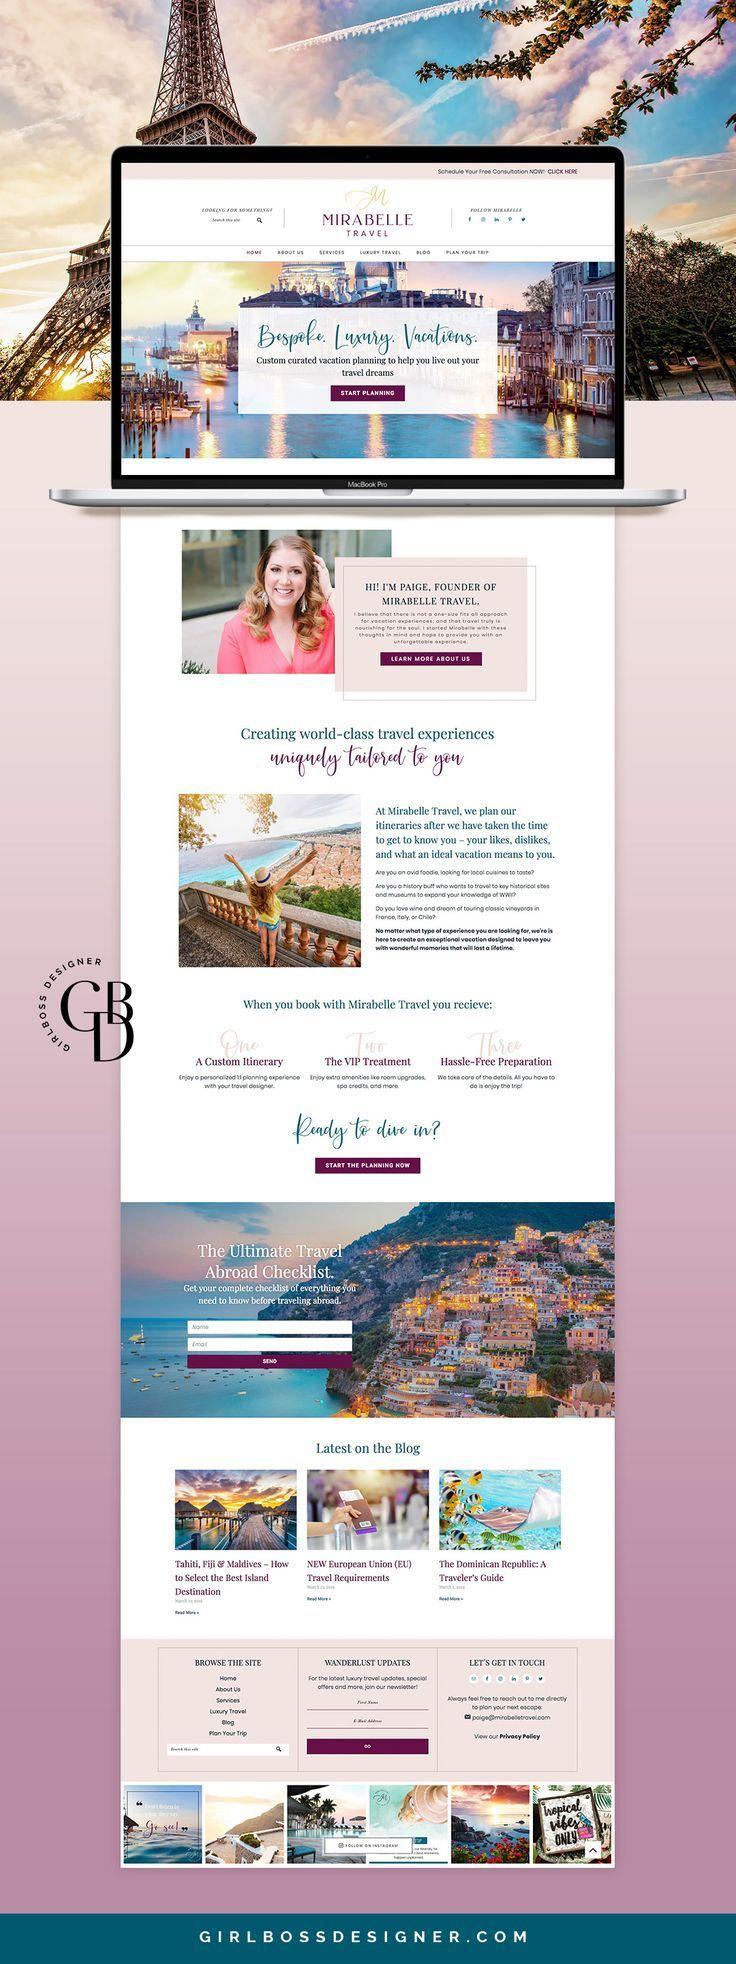 Luxury Travel Designer Branding and Website Design - by Girlboss Designer #travelwebsitedesign #travelbusinessbranding #traveldesign #luxurytravel #womenentrepreneurs #femaleentrepreneurs #girlboss #graphicdesign #logodesign #colorpaletteinspiration